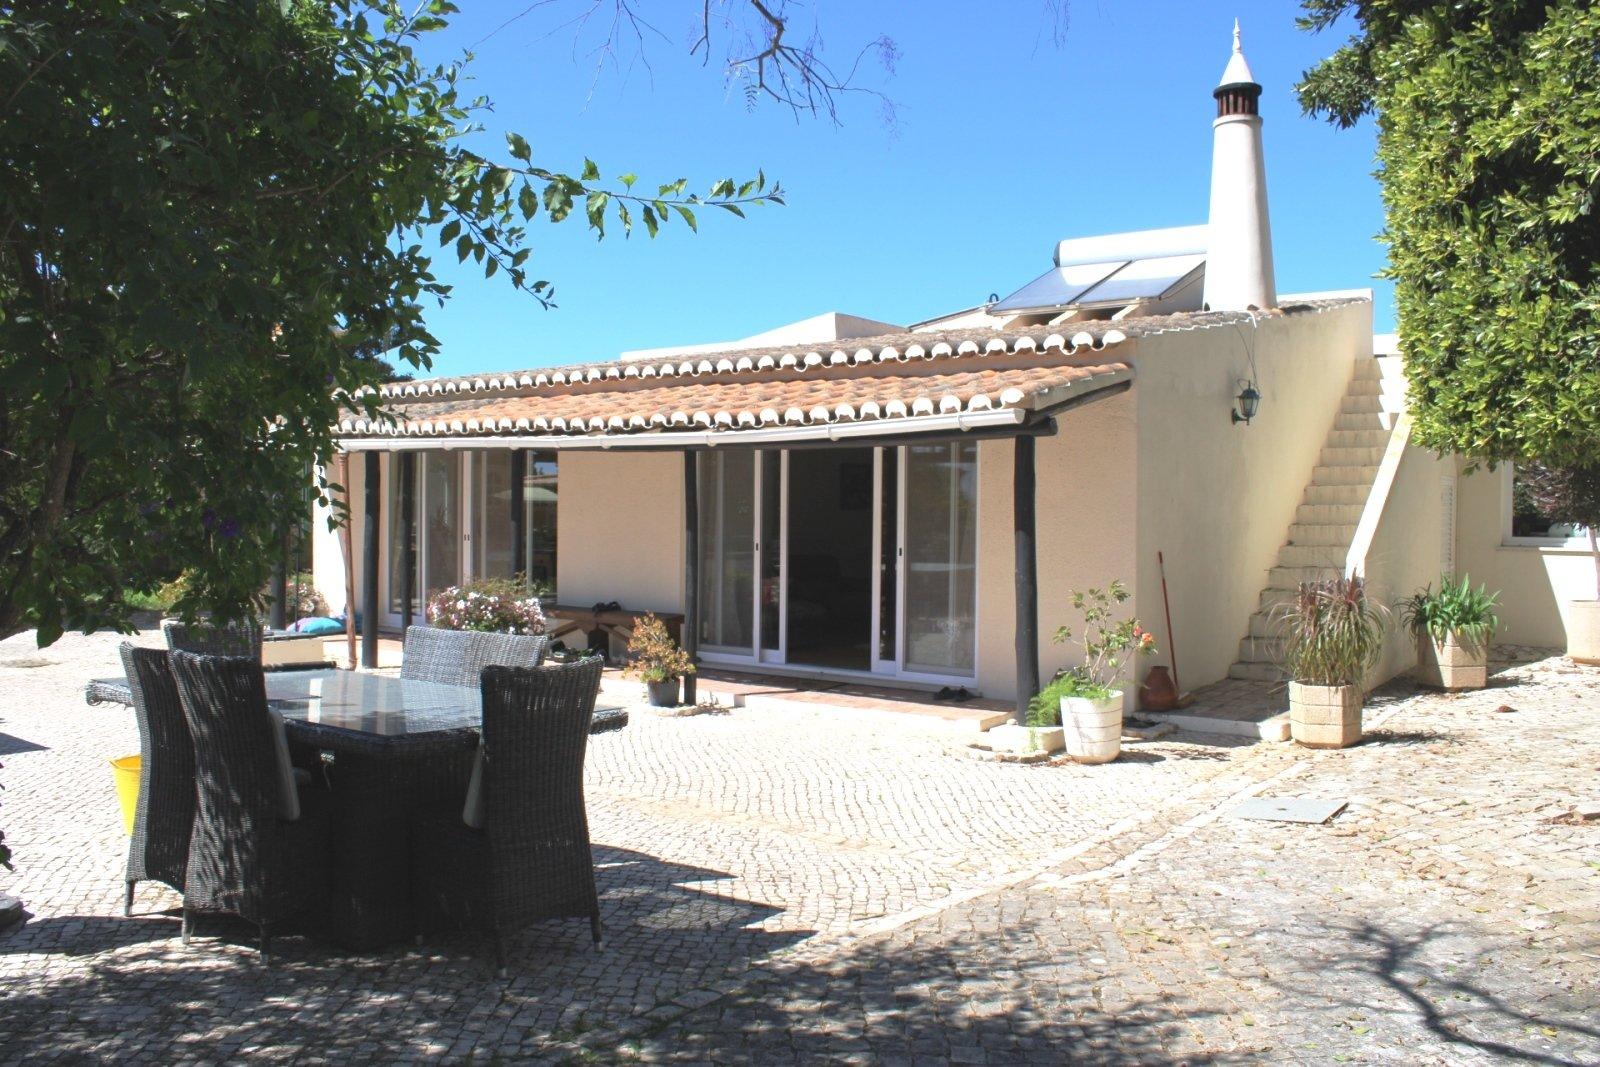 4 Bedroom Villa Praia da Luz, Western Algarve Ref: GV616